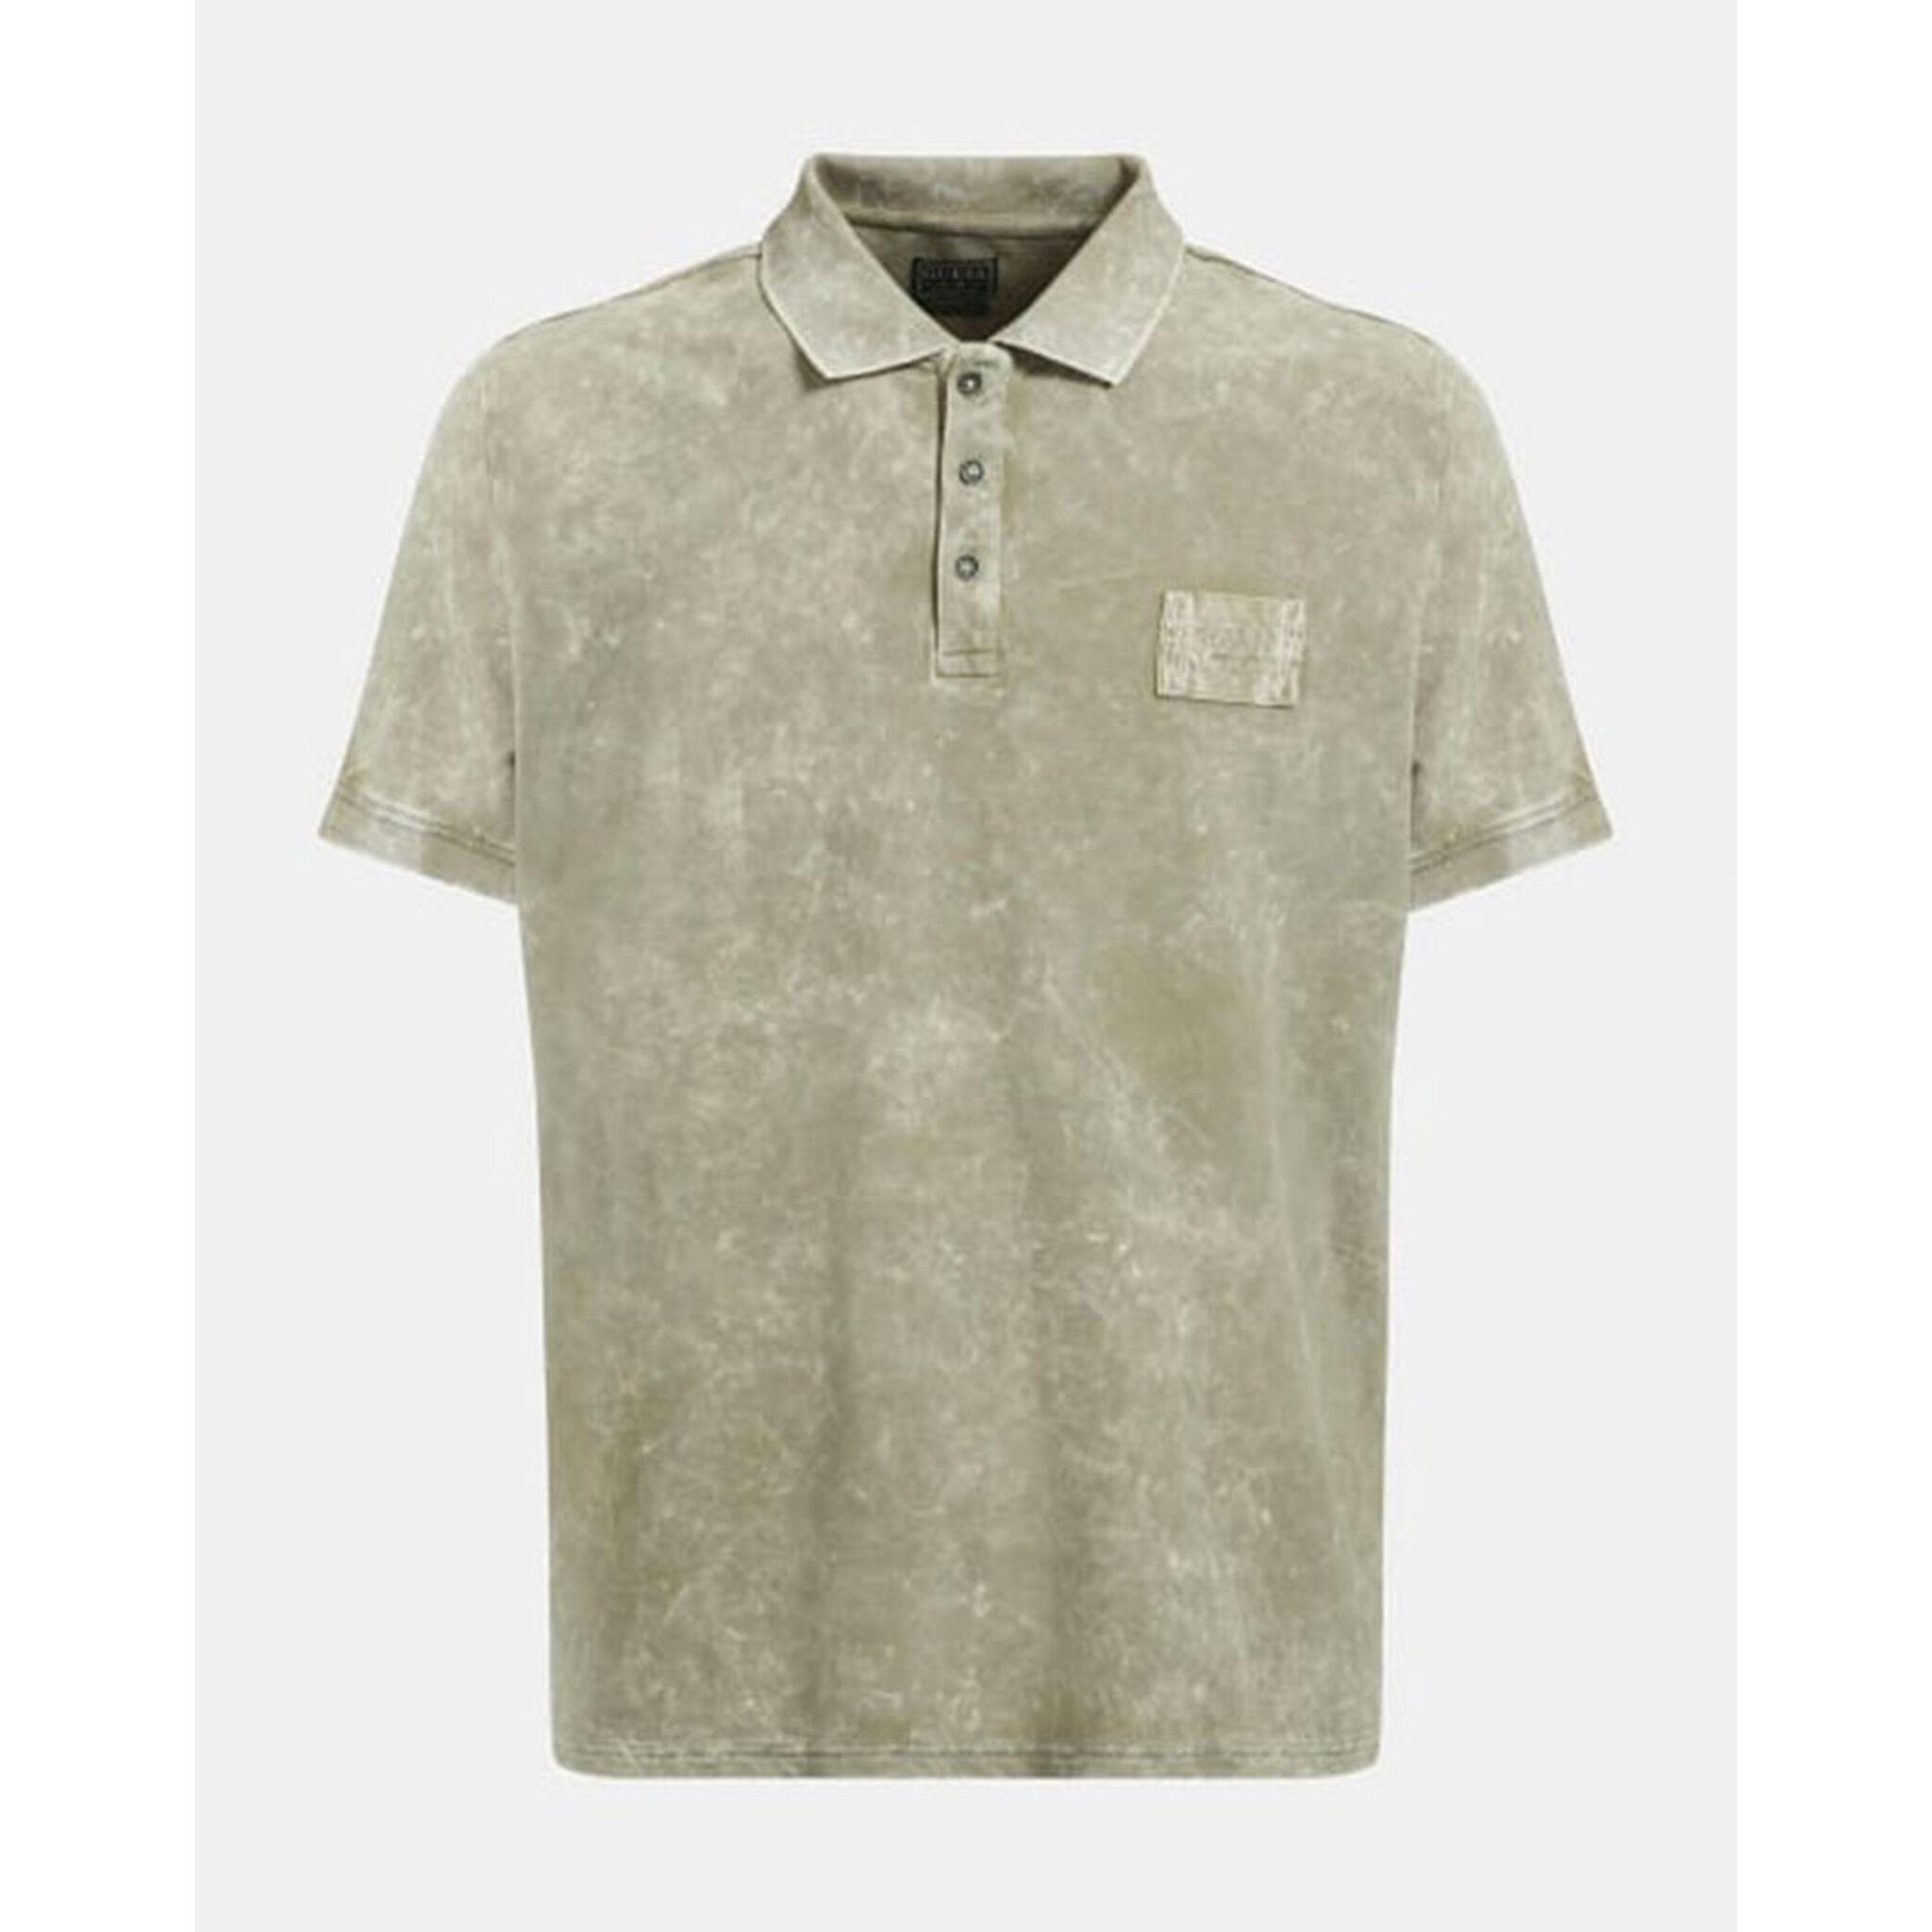 Farley Polo Short Sleeves